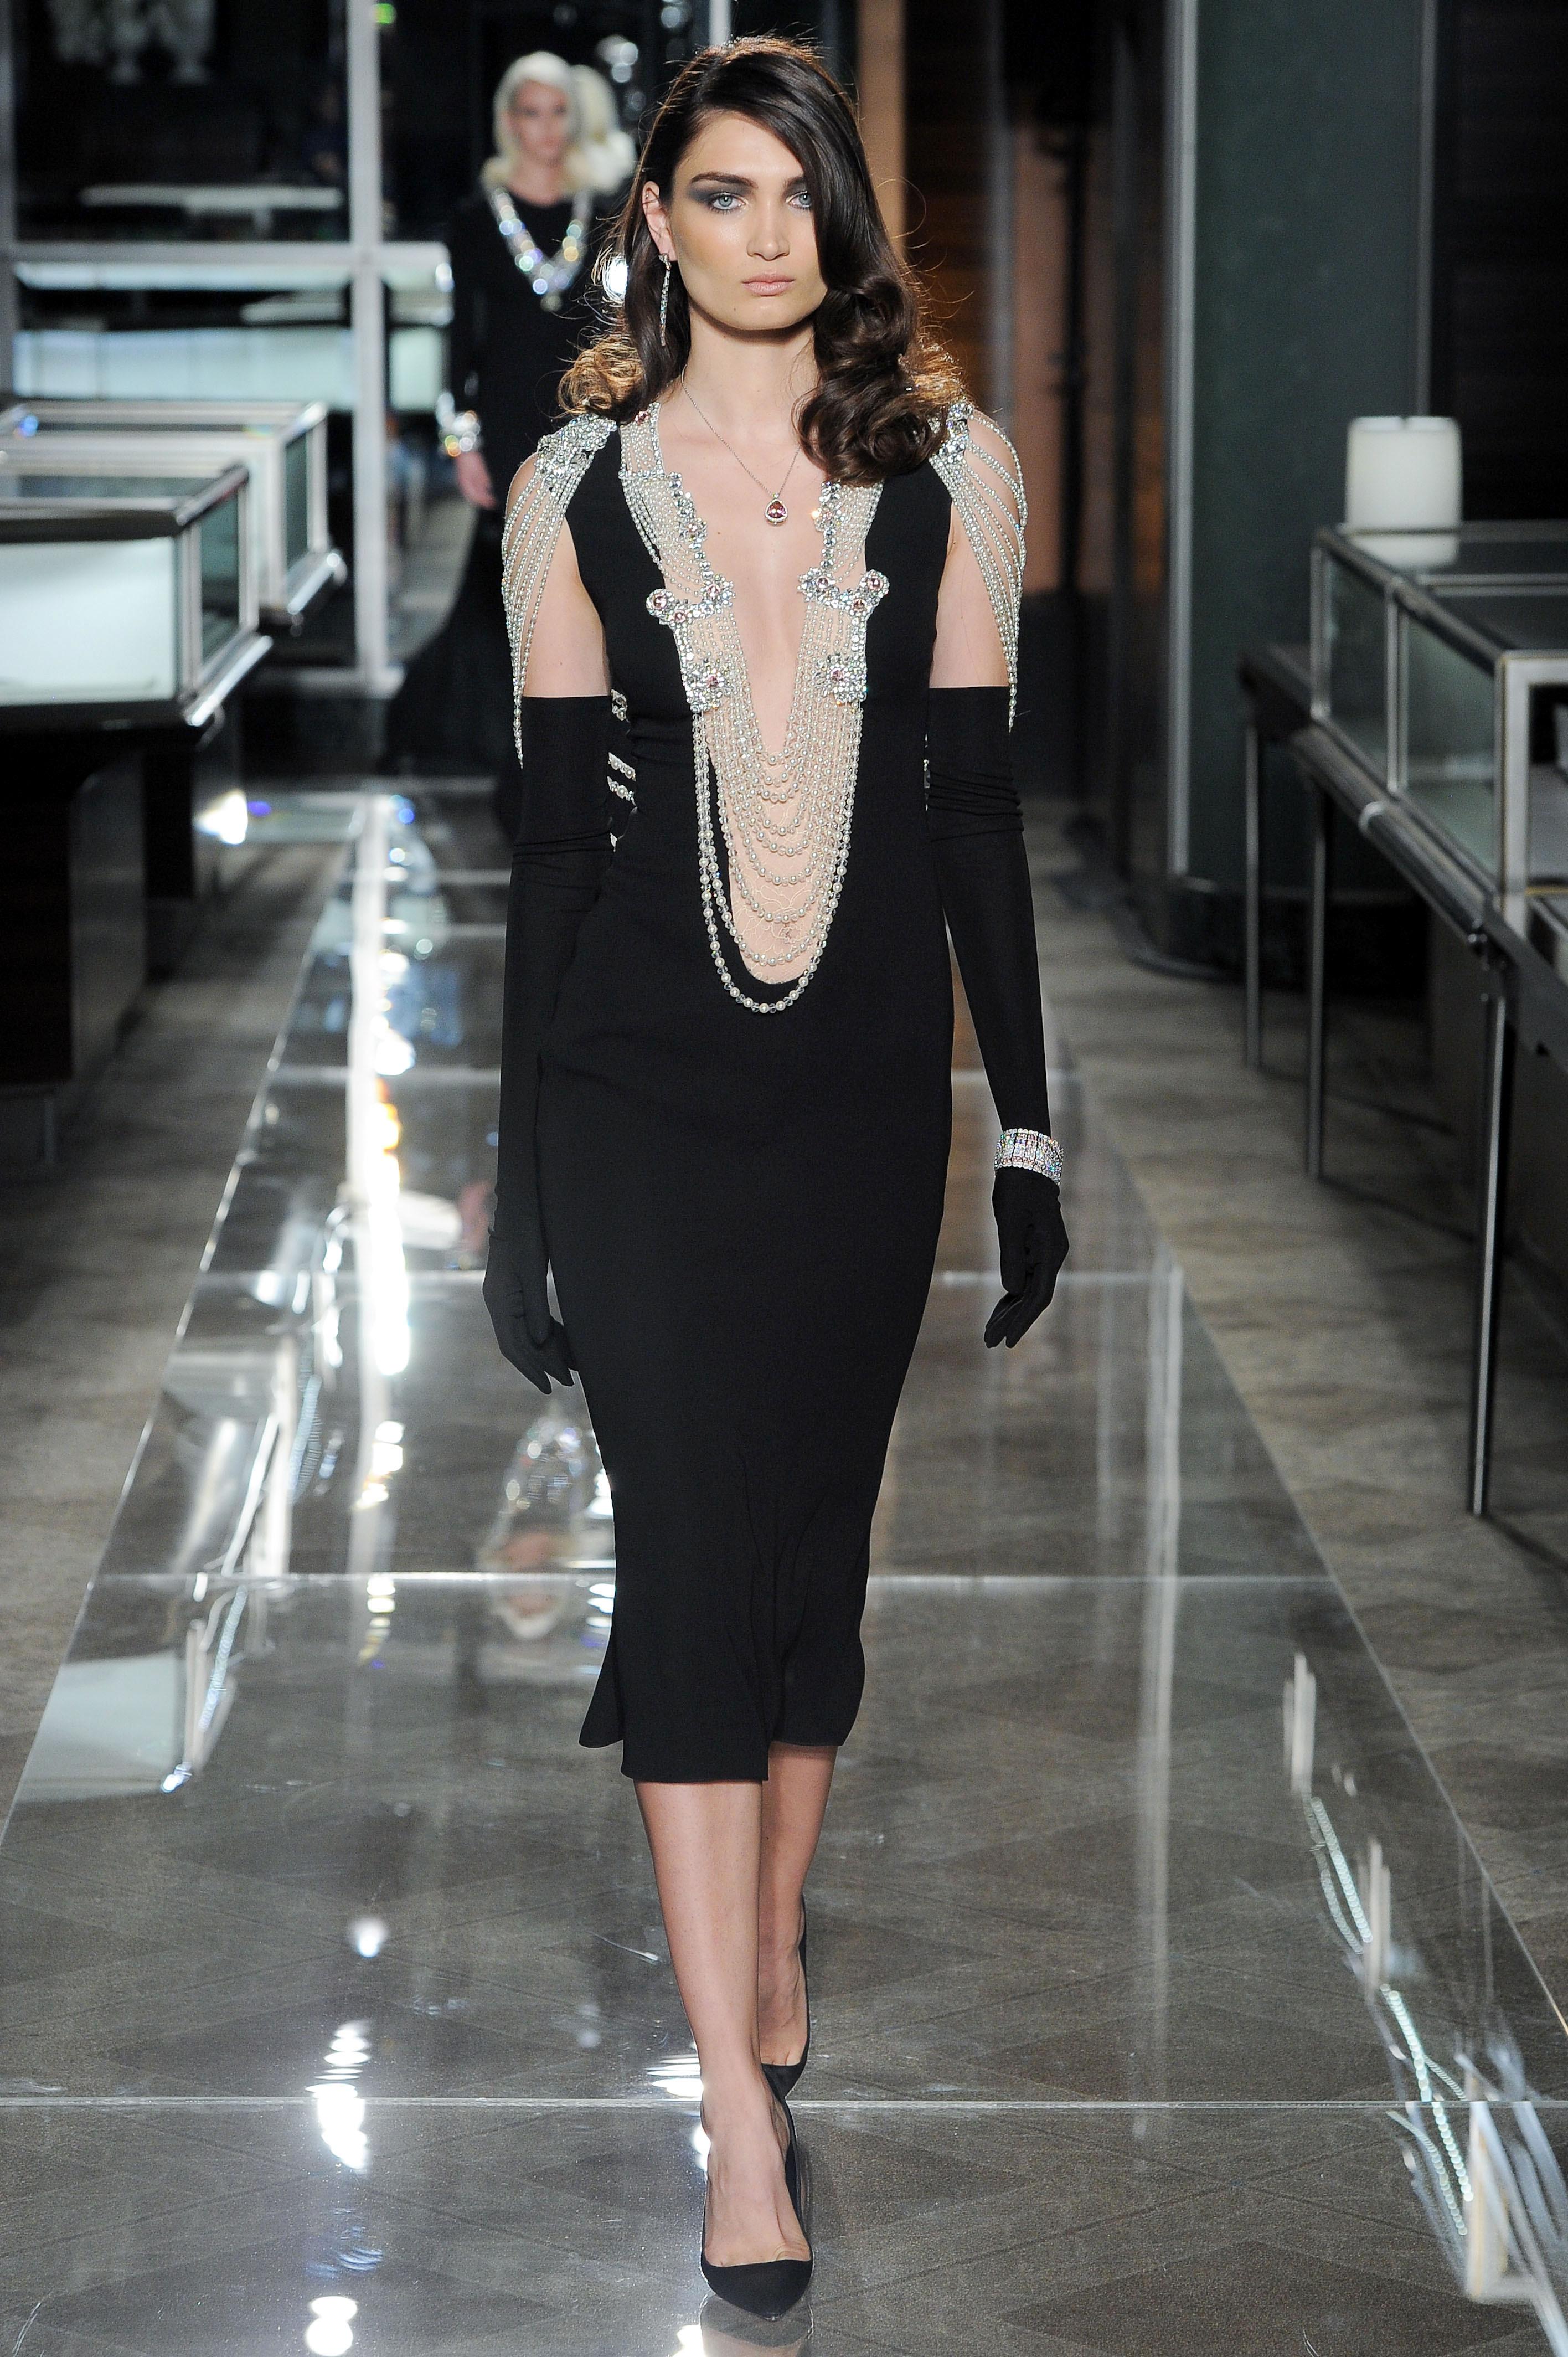 reem acra spring 2018 black wedding dress with knee-length hem and beading